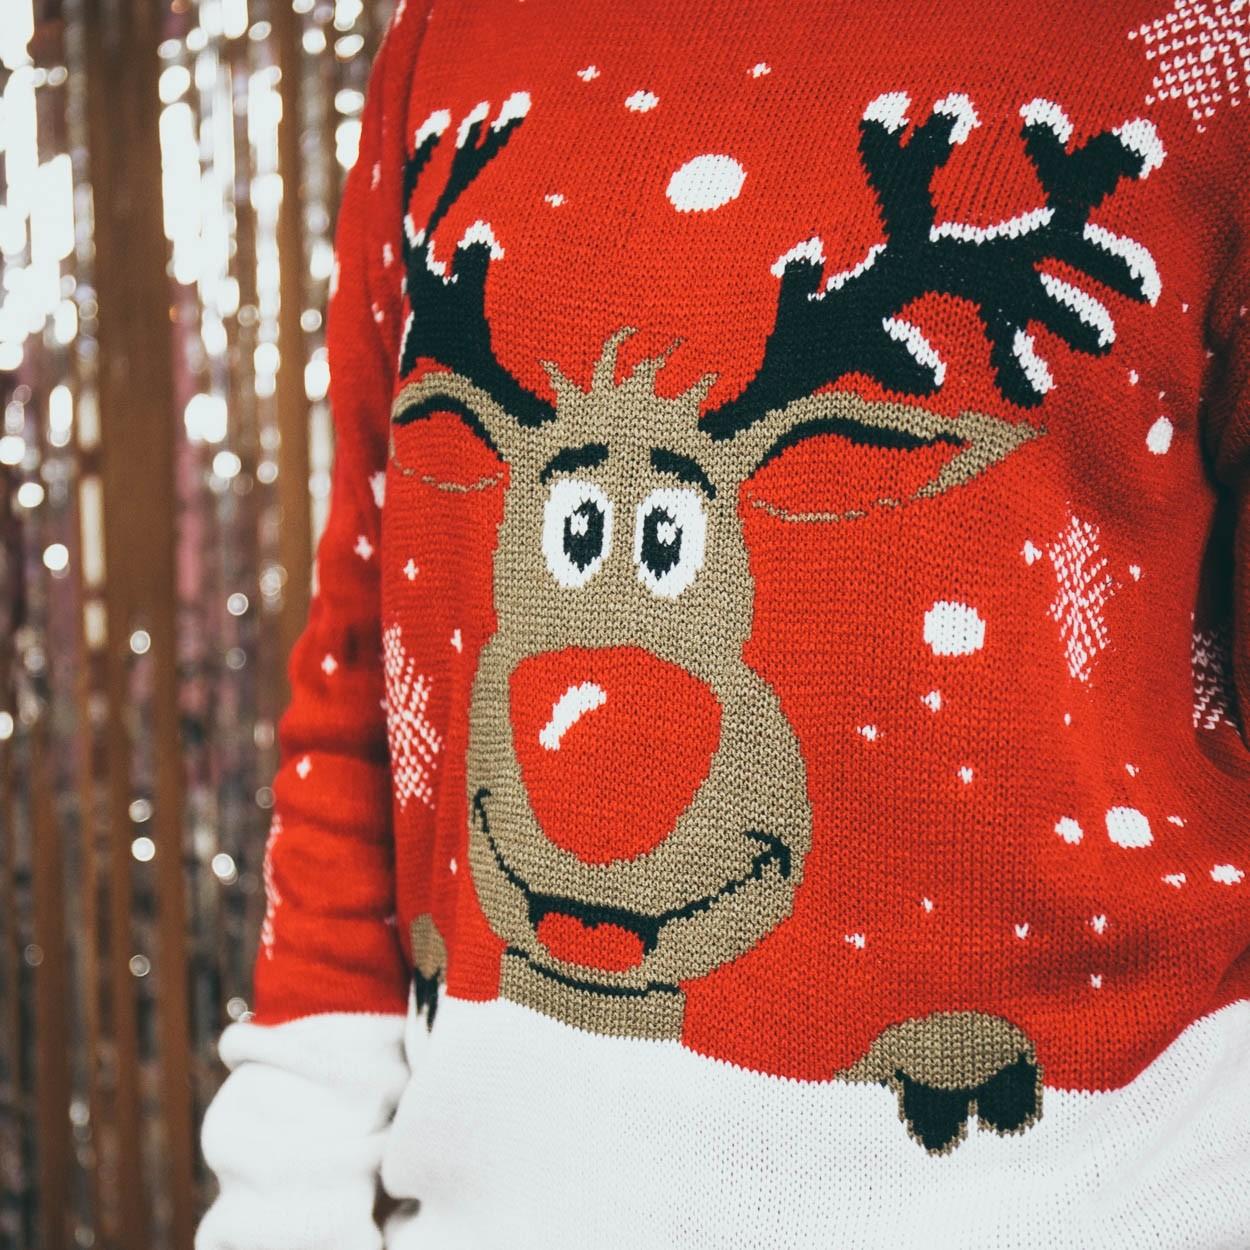 Kersttrui Vandaag Besteld Morgen In Huis.Kerst Trui Rudolph Sweaters Comegetfashion